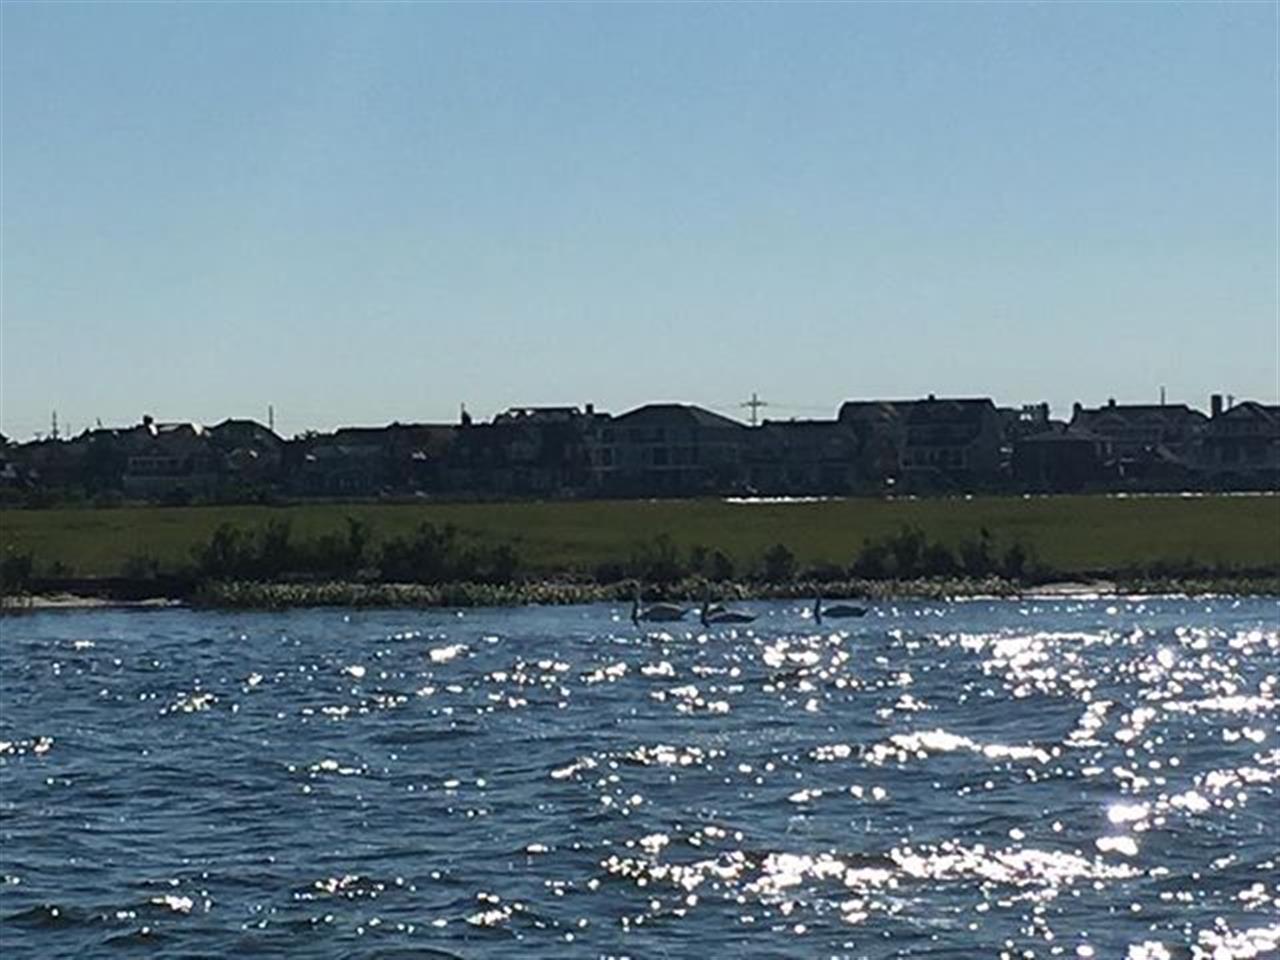 The swans of Herring Island... #birds #boats #nj #goodmorning #jshn #leadingrelocal